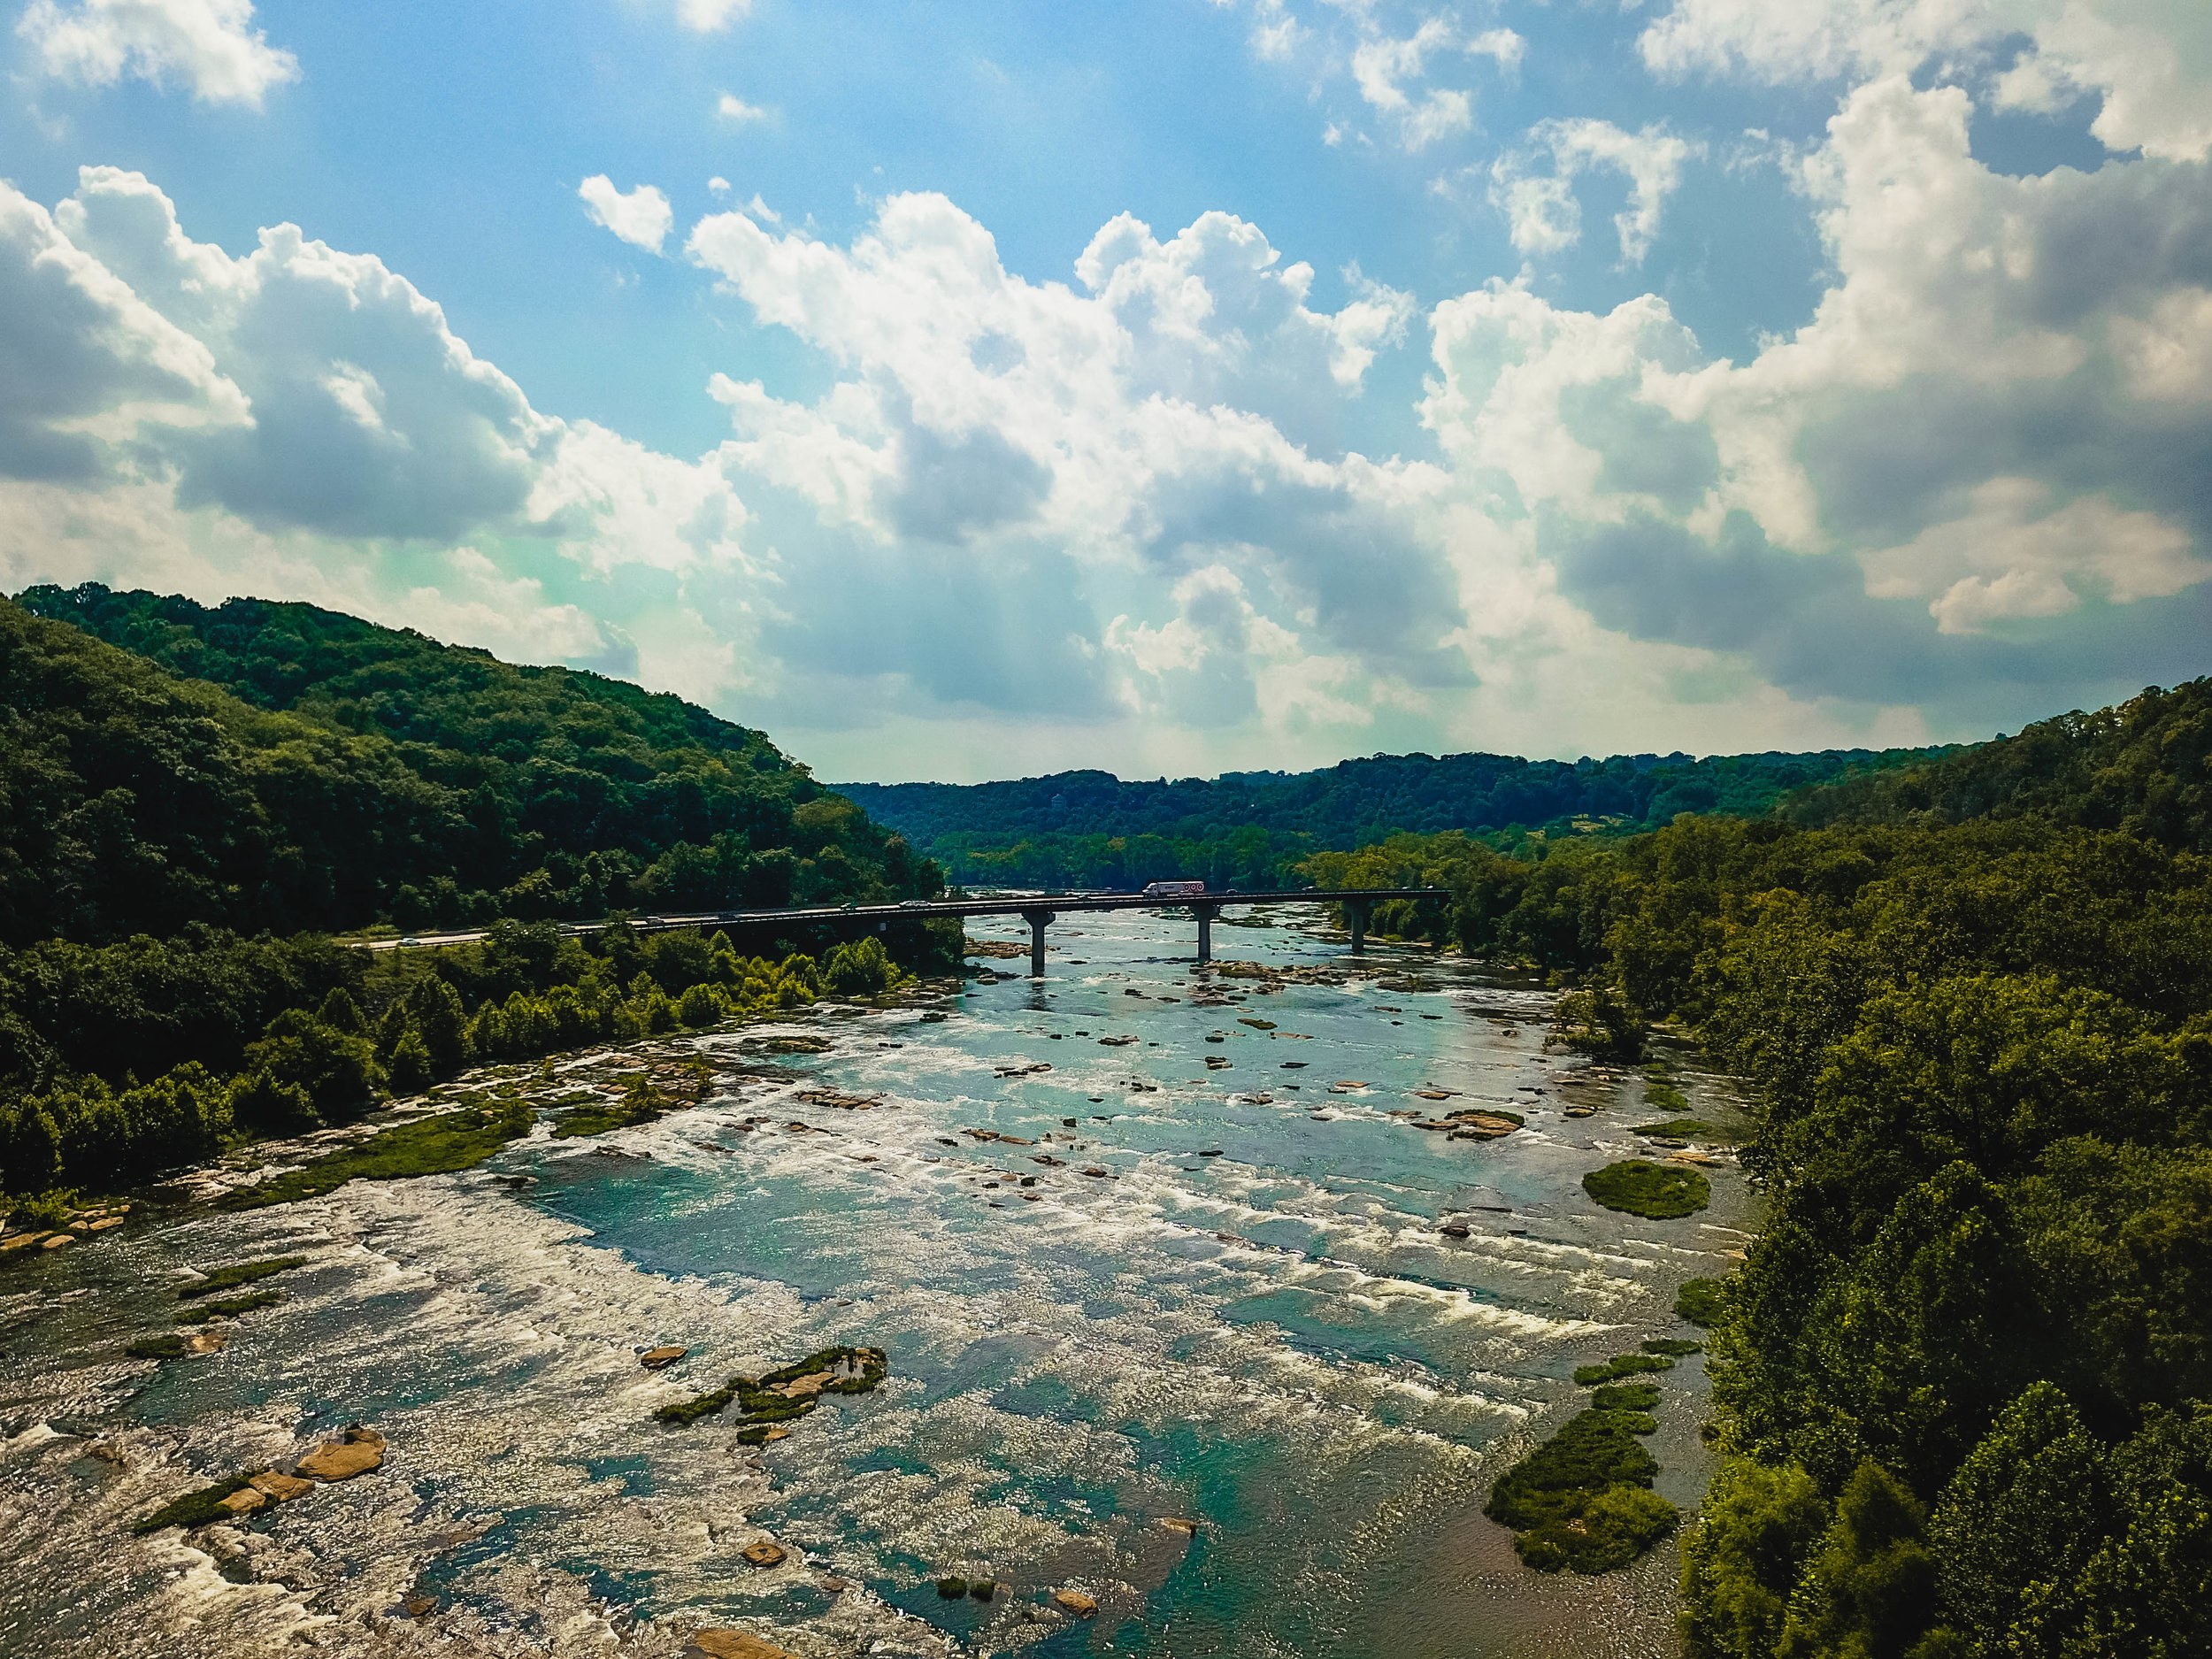 davidscotto river.jpg